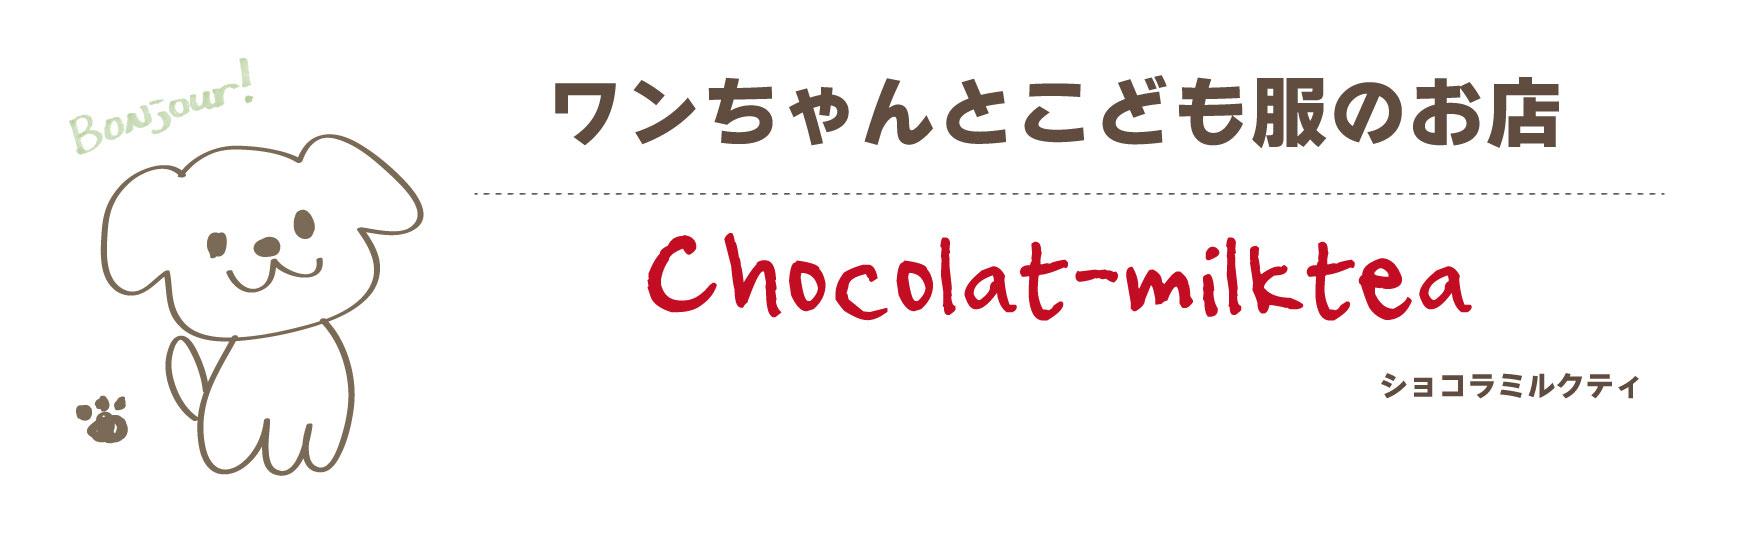 chocolat-milktea